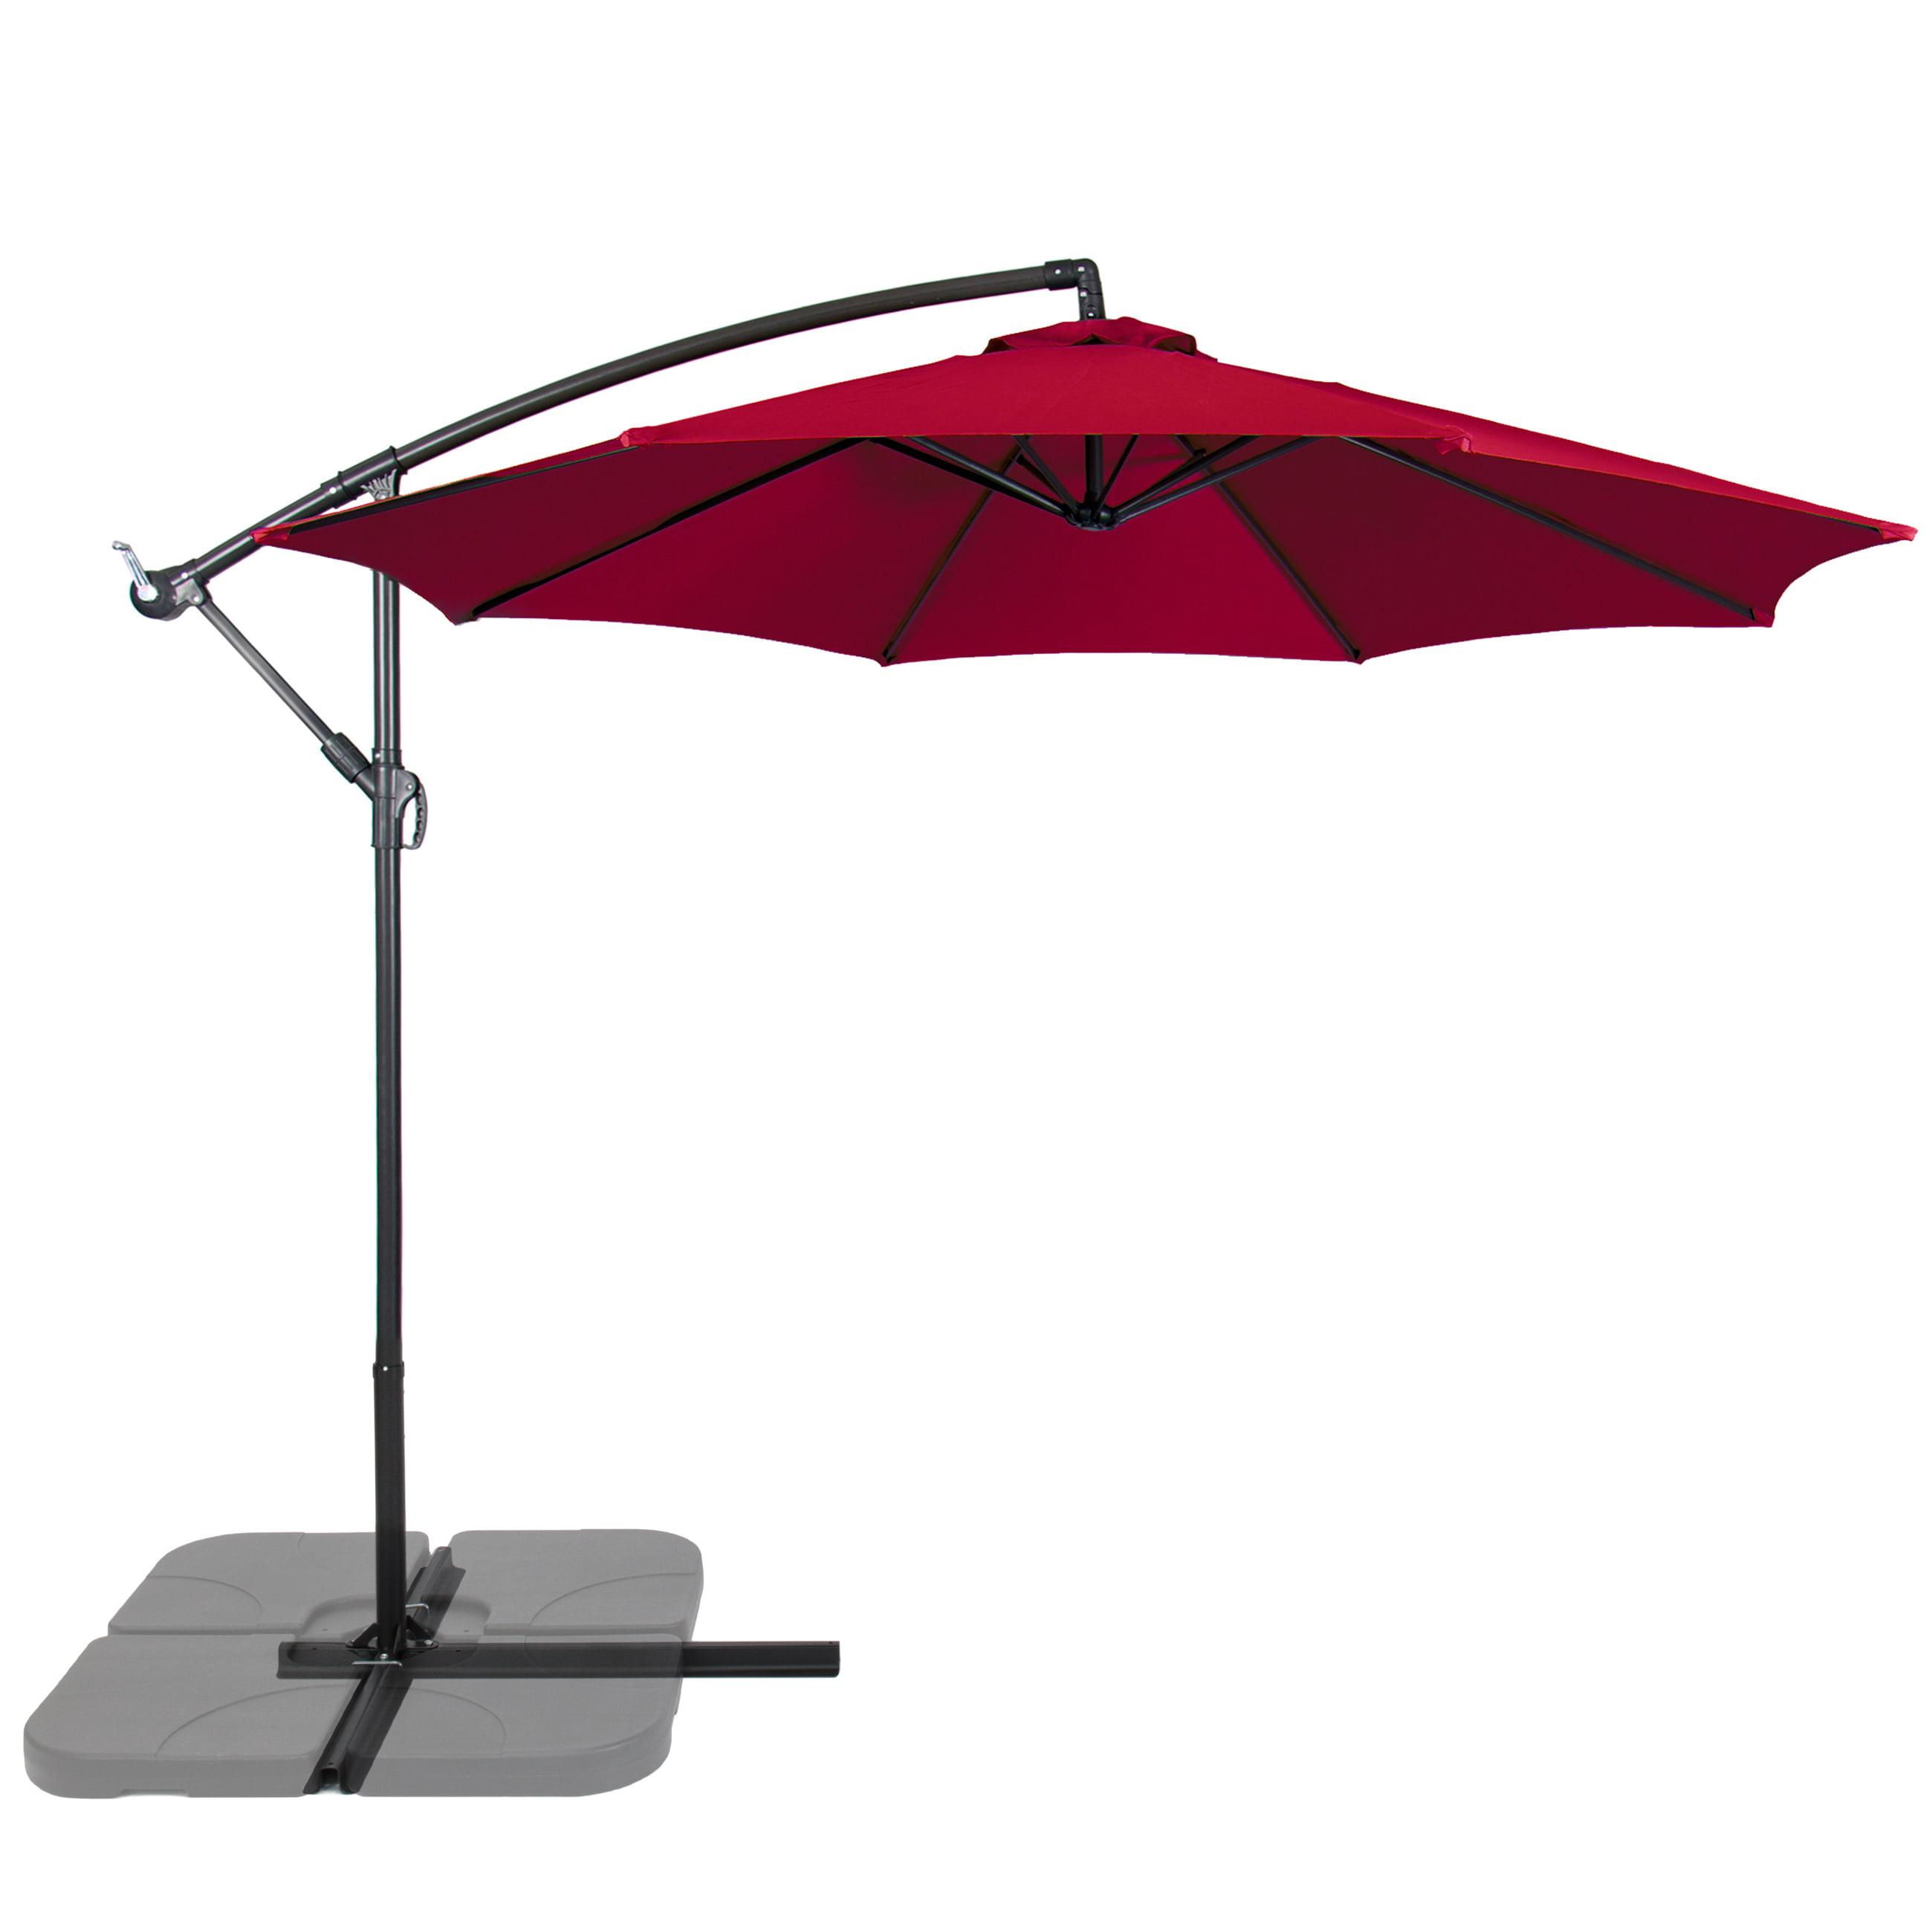 Patio Umbrella Offset 10FT Hanging Outdoor Market Umbrella New - Multiple Colors